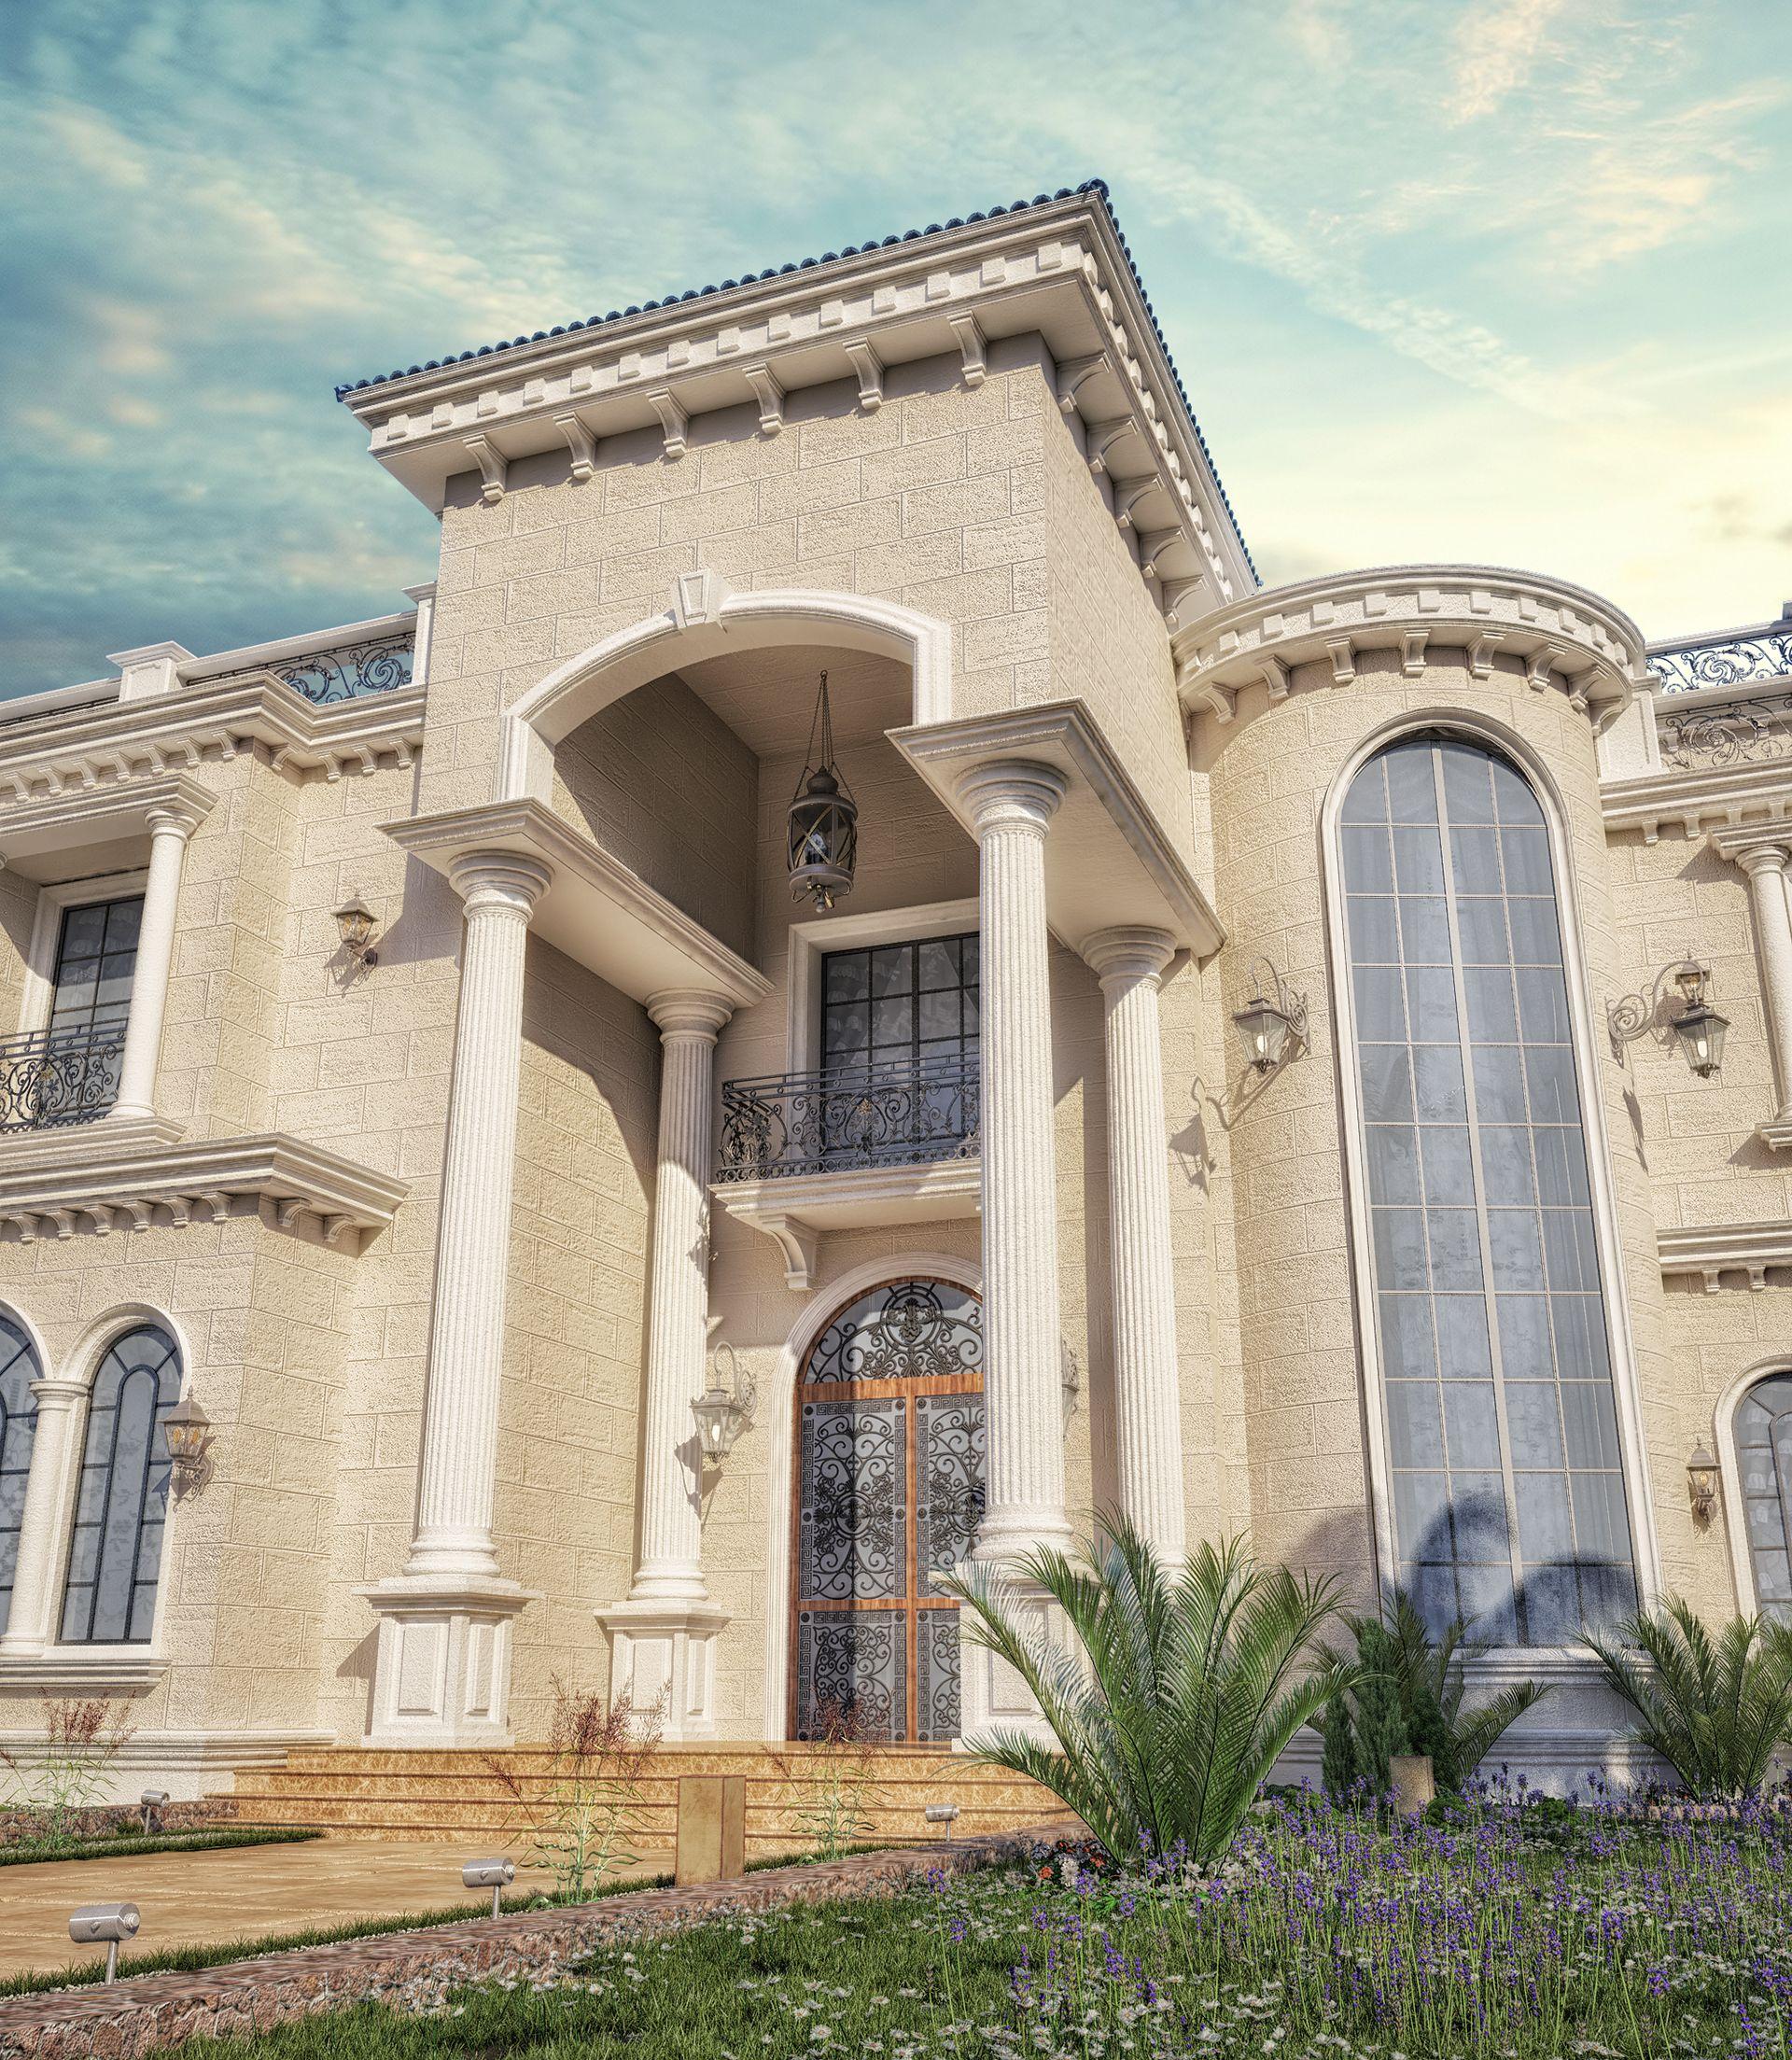 Luxury Mansion Interior Qatar On Behance: Private Villa Design At Doha-qatar On Behance